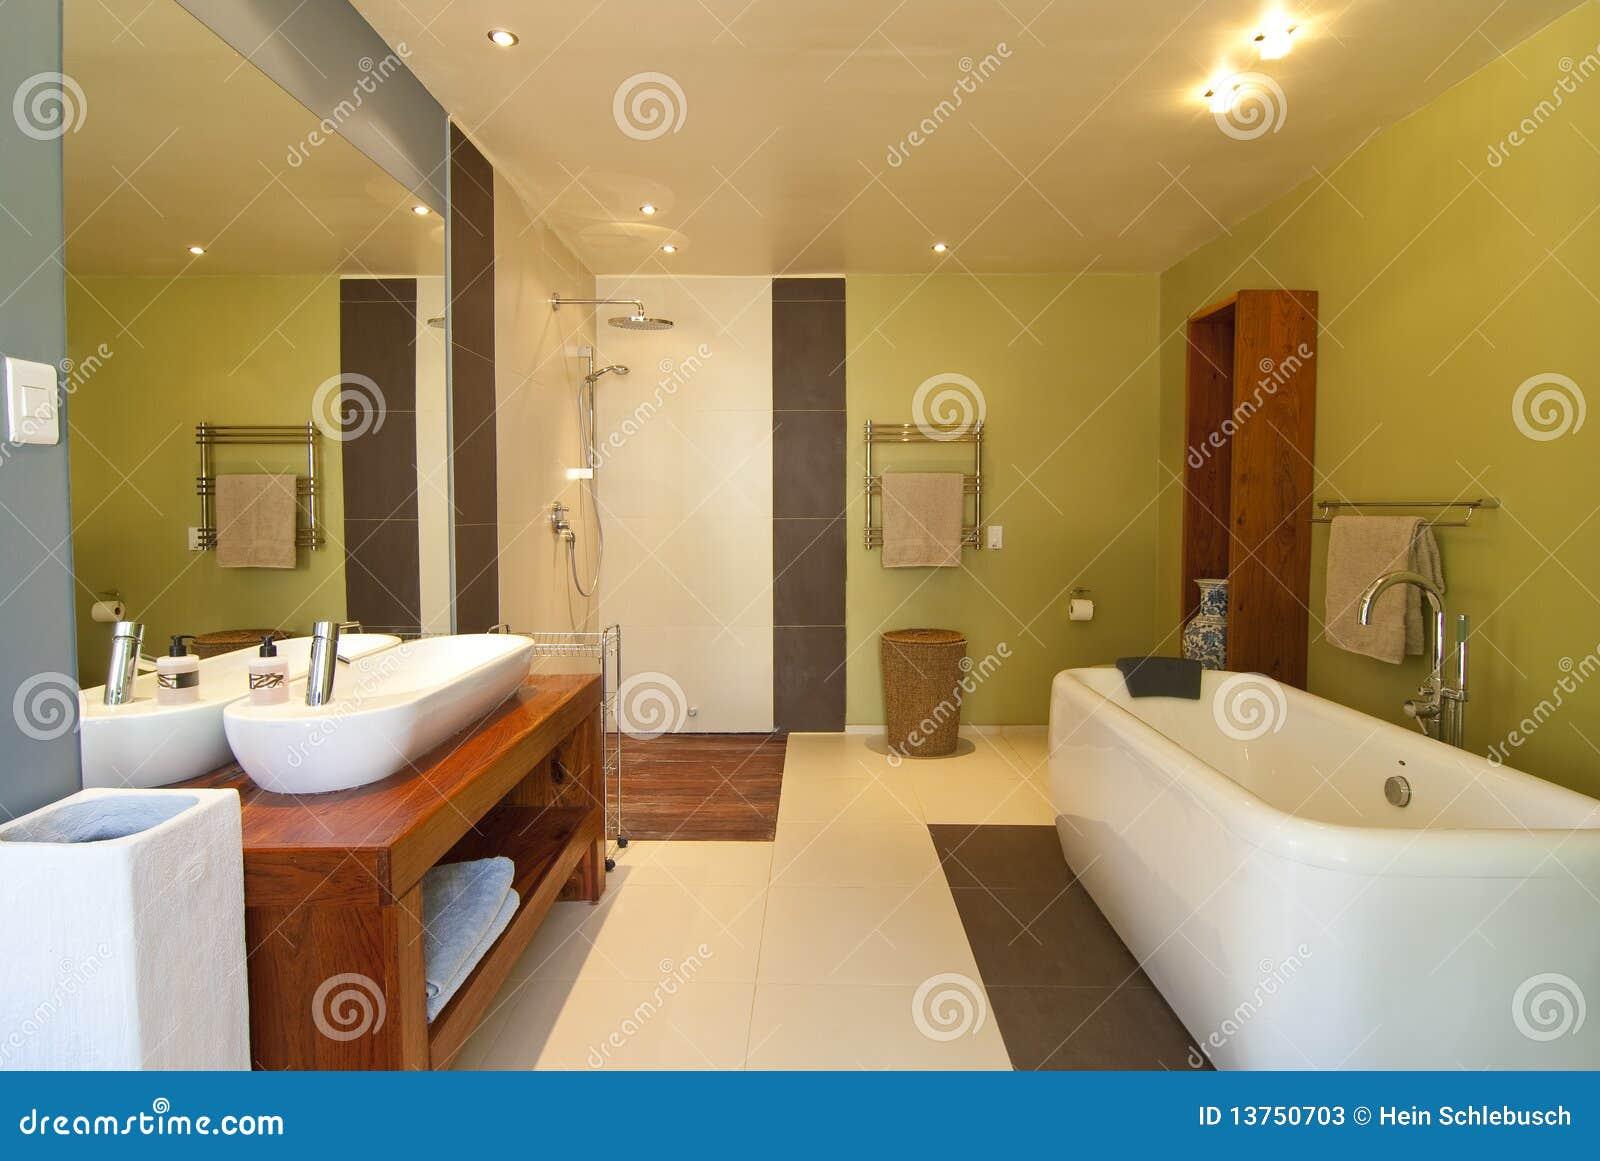 Stanza da bagno moderna fotografie stock immagine 13750703 - Stanza da bagno ...